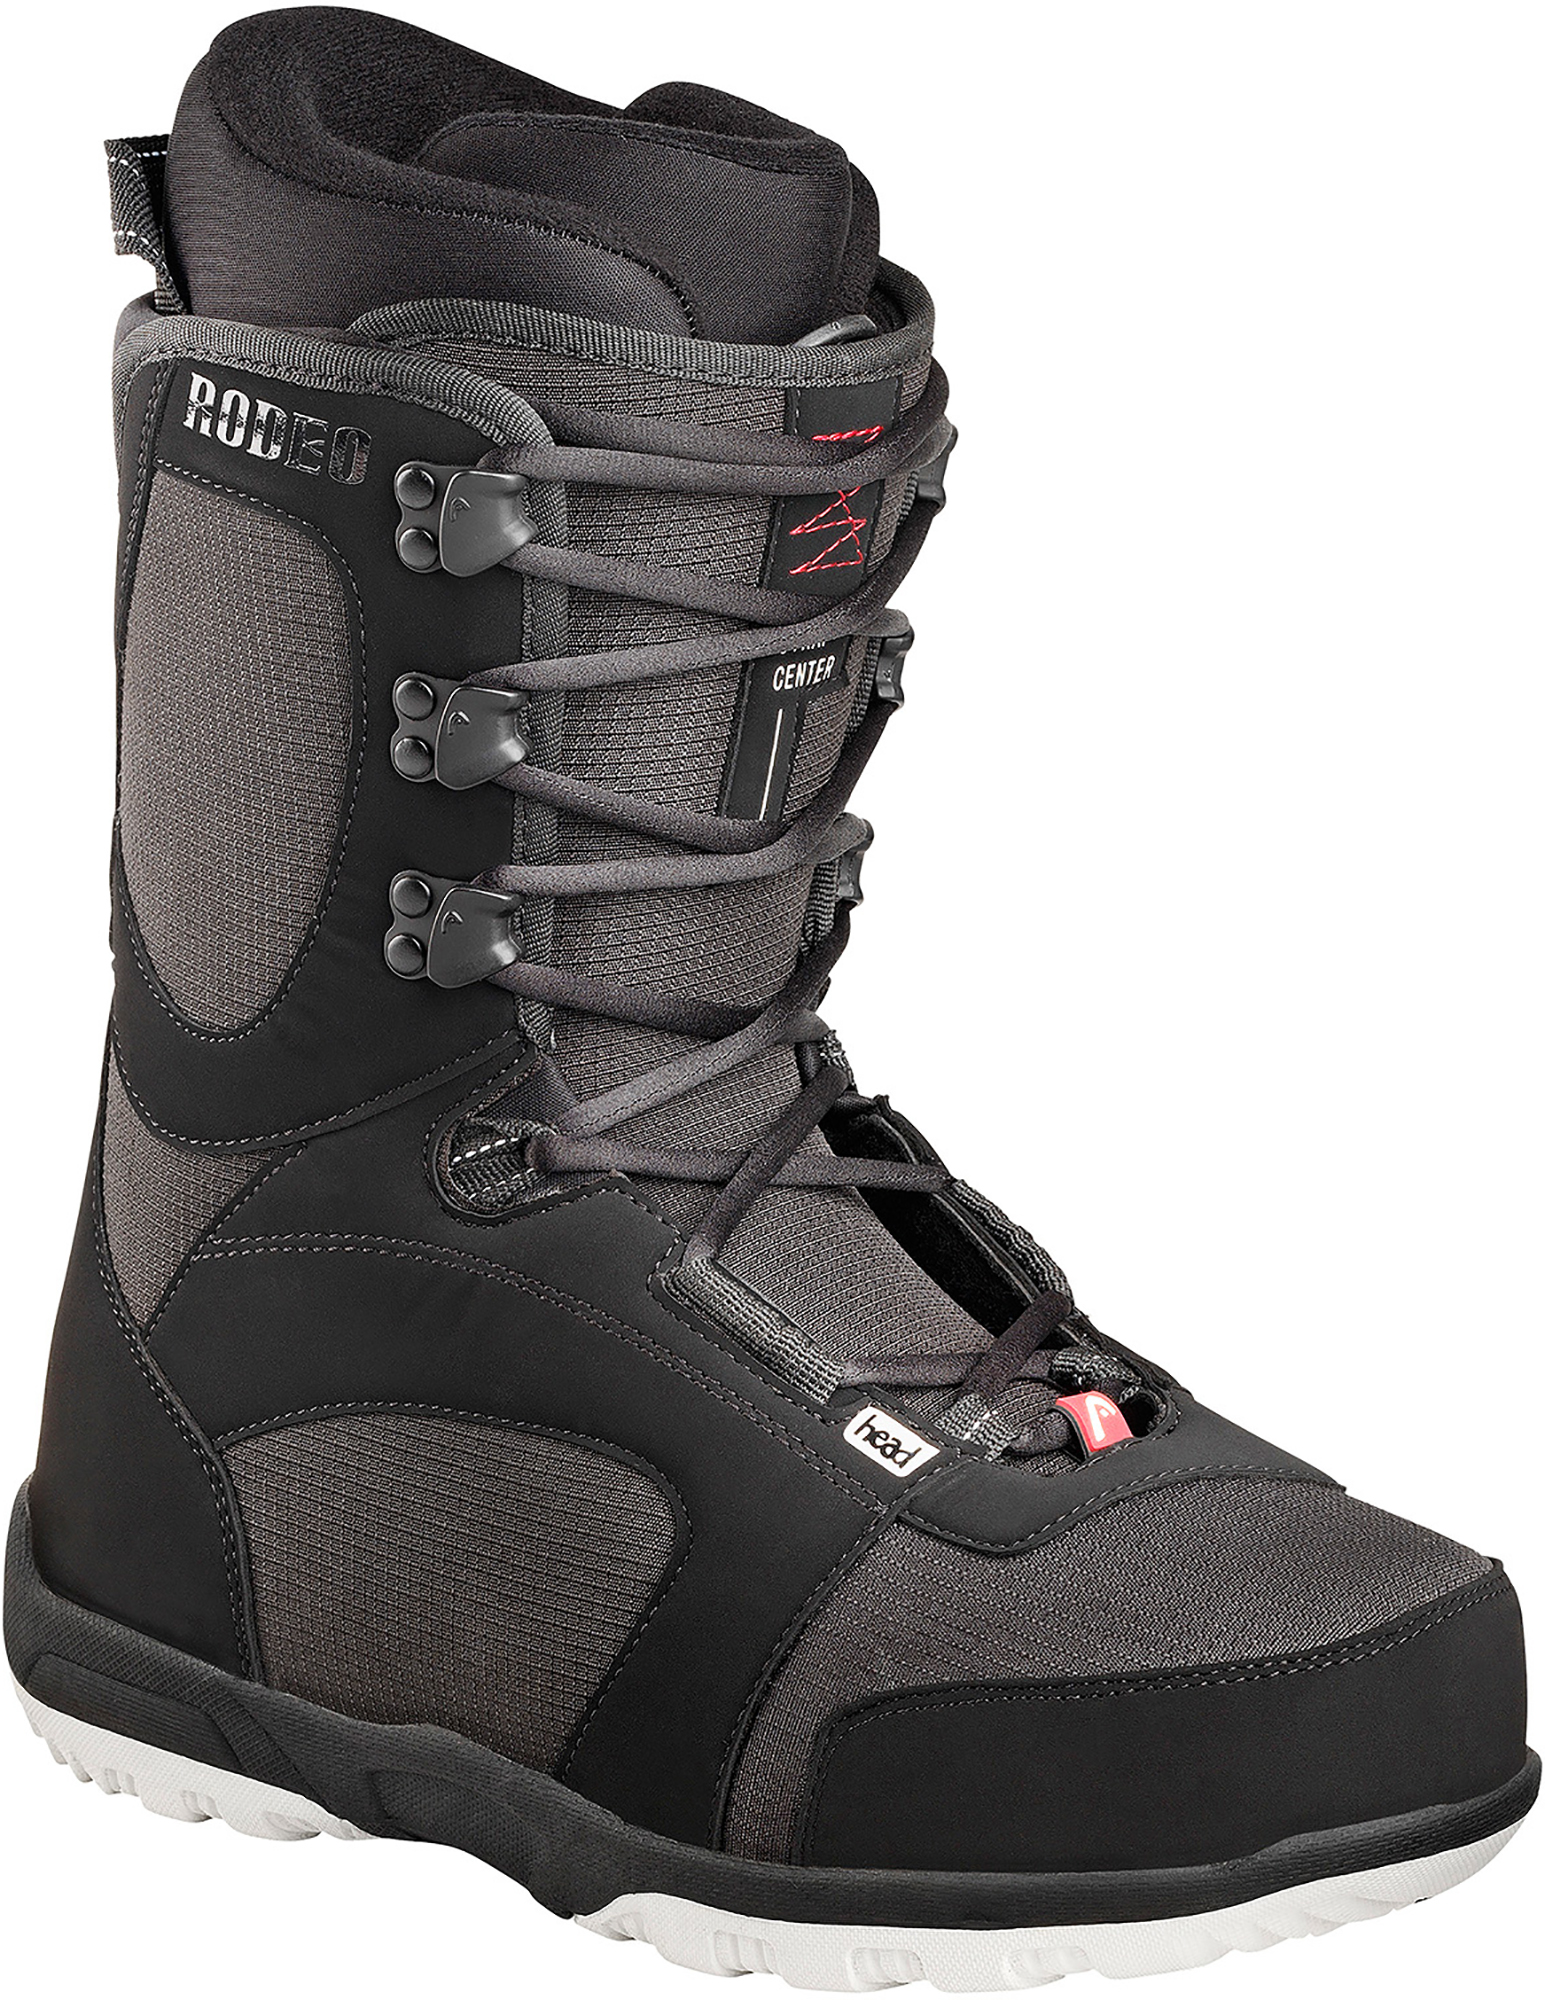 Head Сноубордические ботинки Head Rodeo, размер 43 сноубордические перчатки vermont